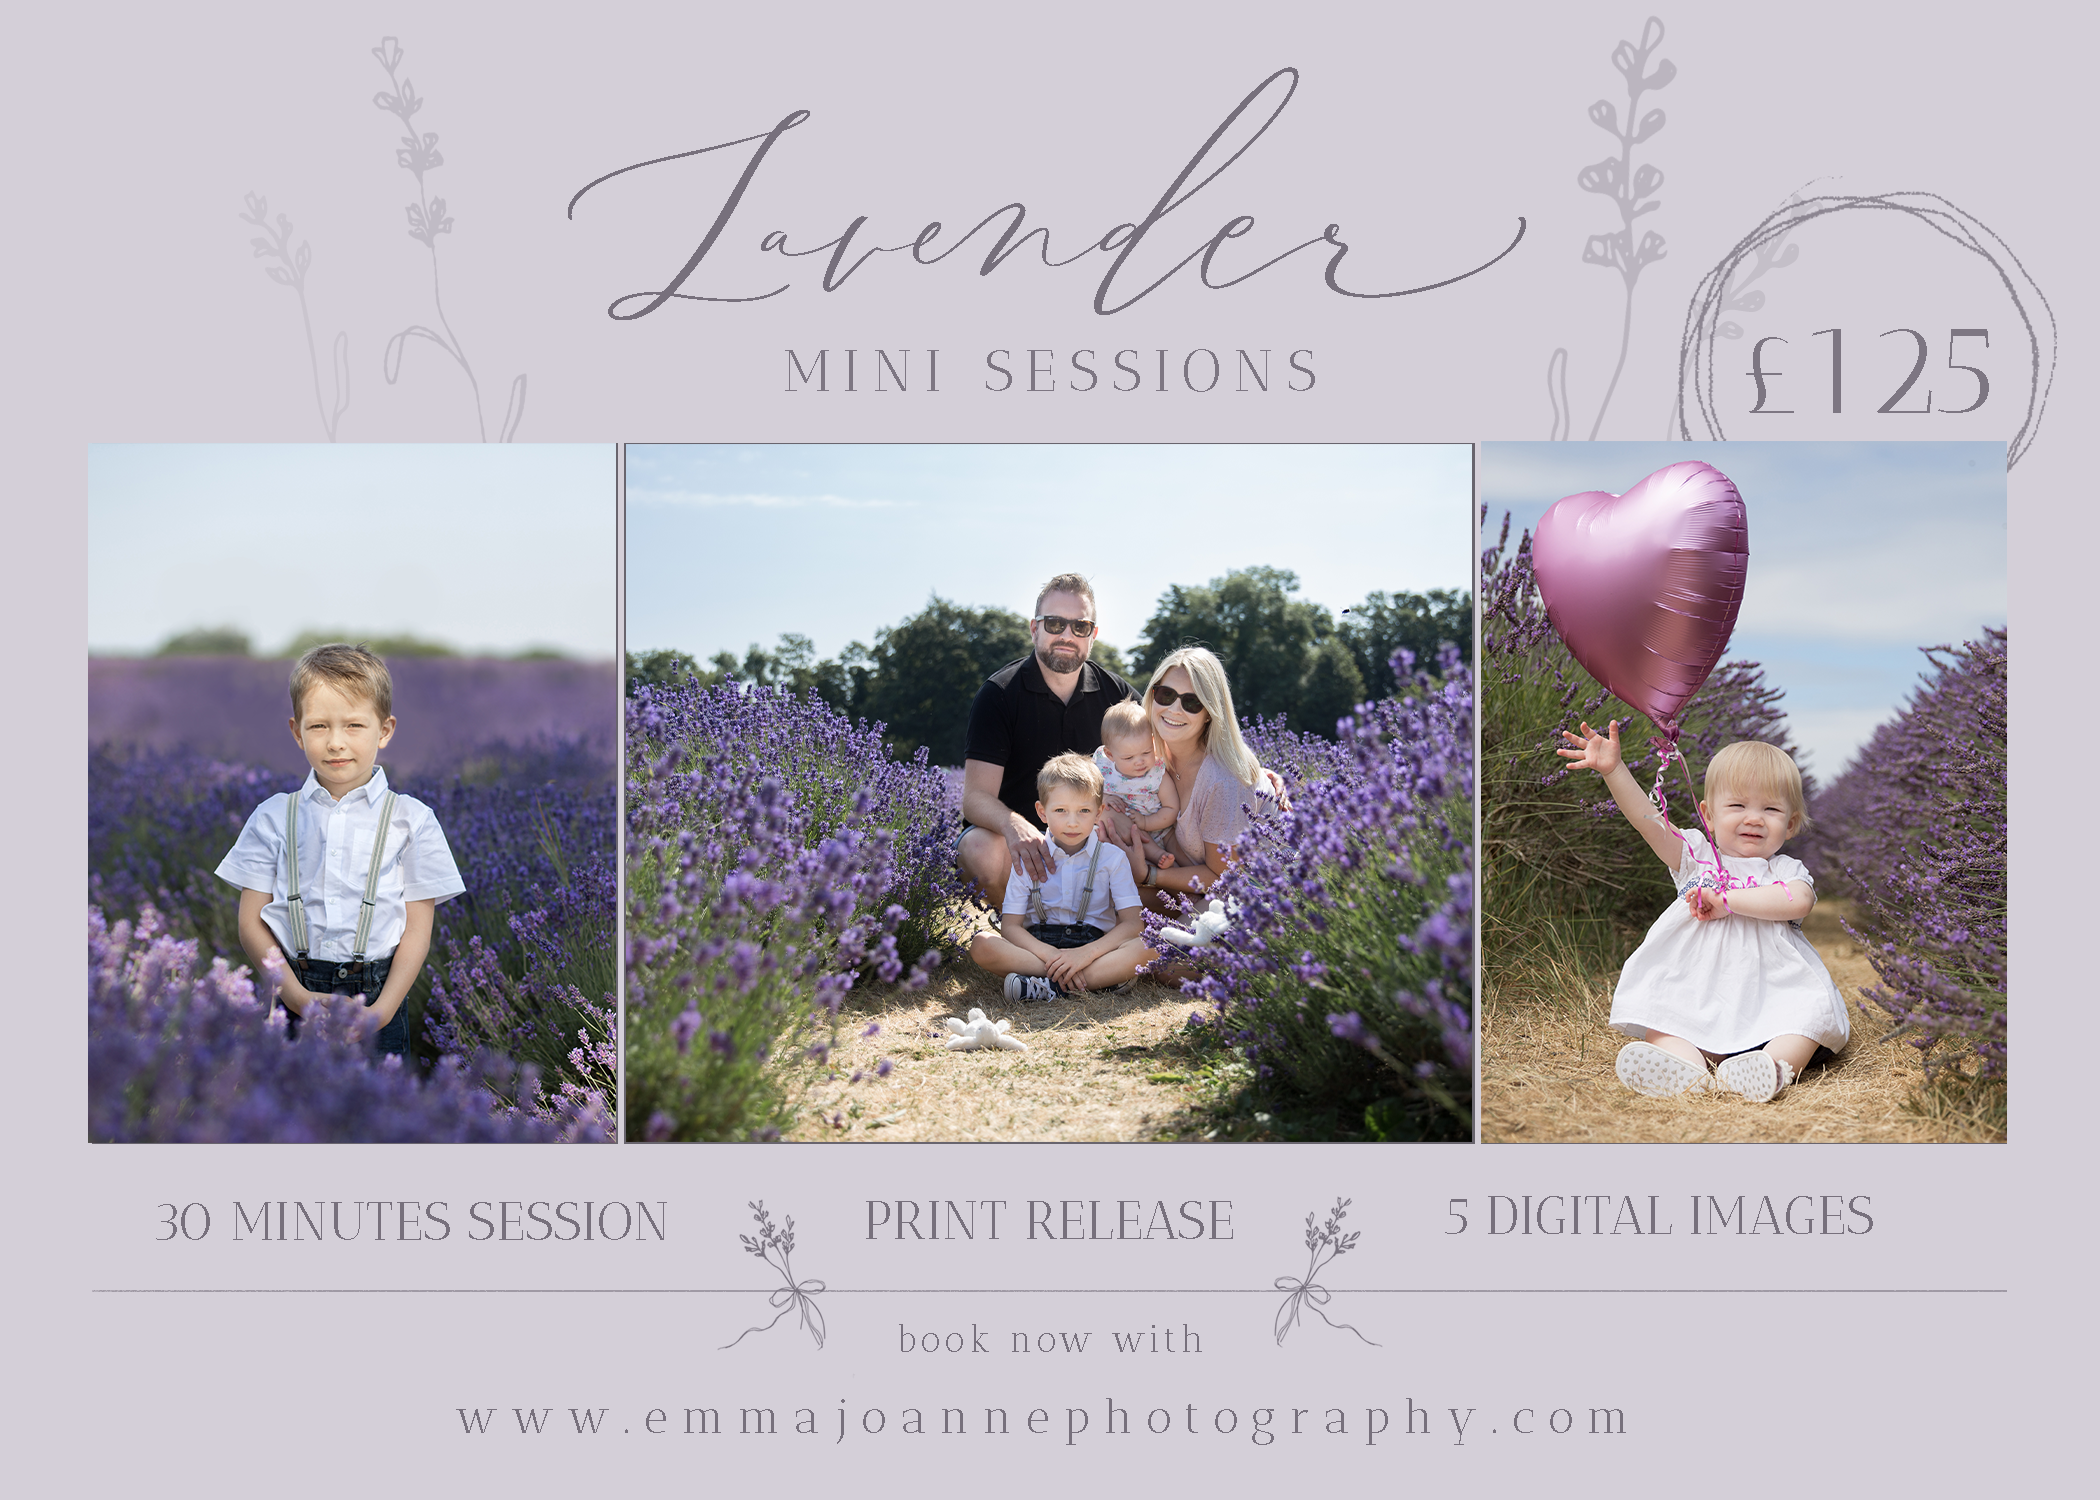 2019 Lavender Mini Sessions.png